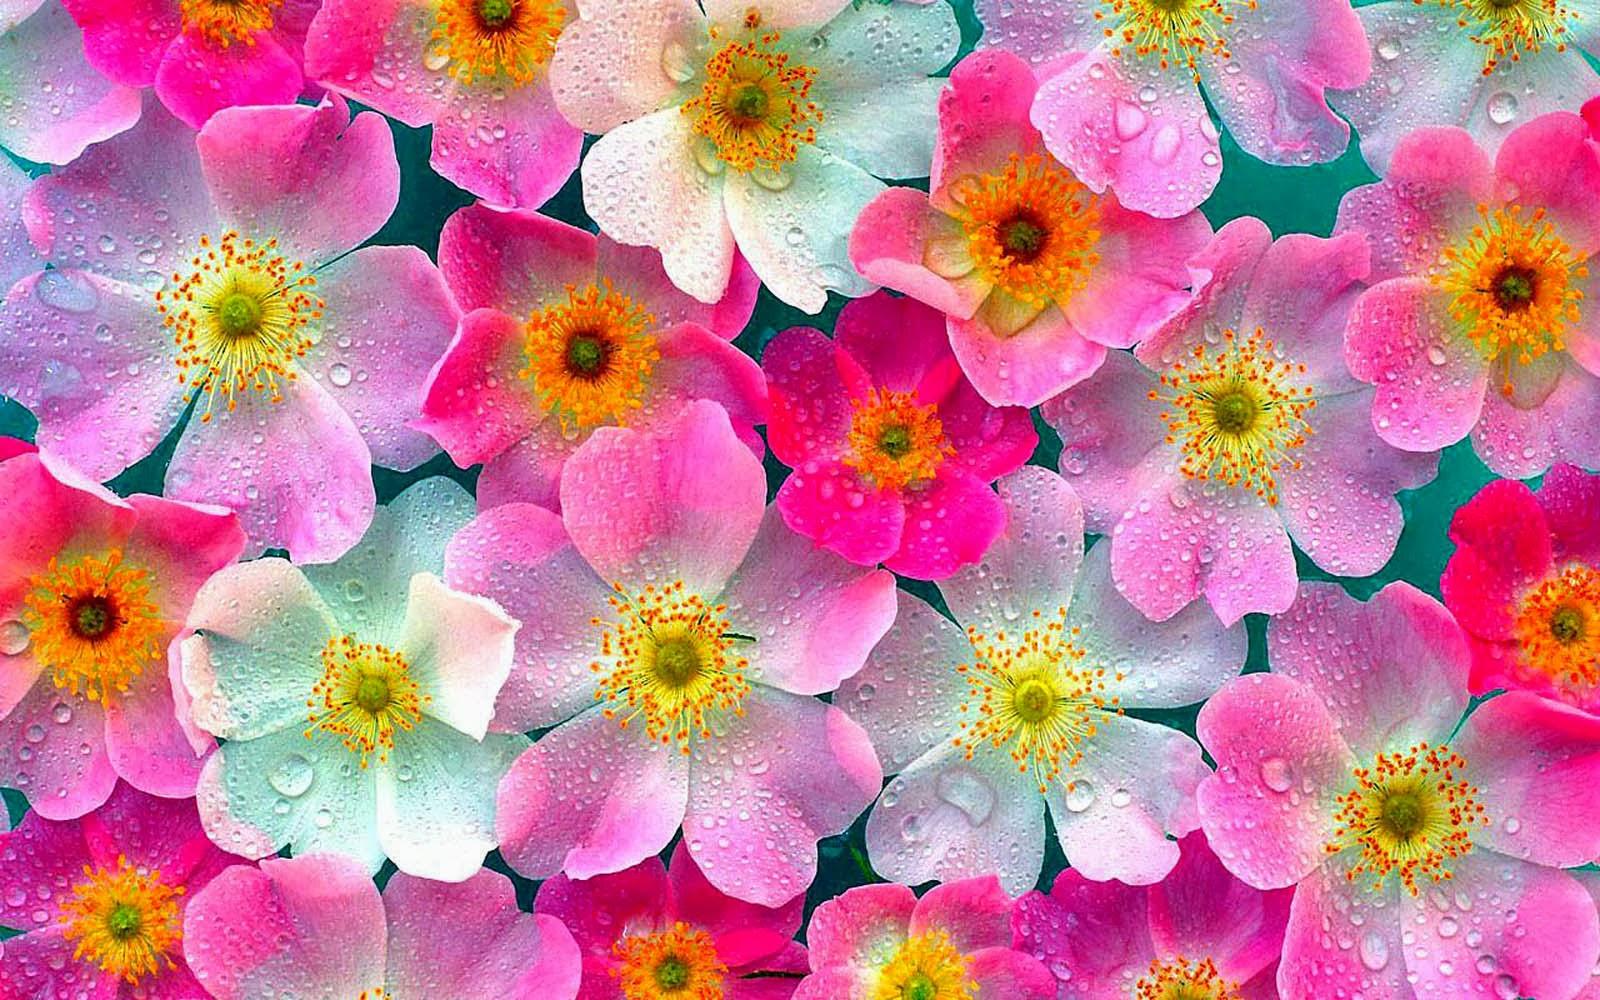 Aneka Gambar Bunga Lengkap Indah Cantik Gambar Foto